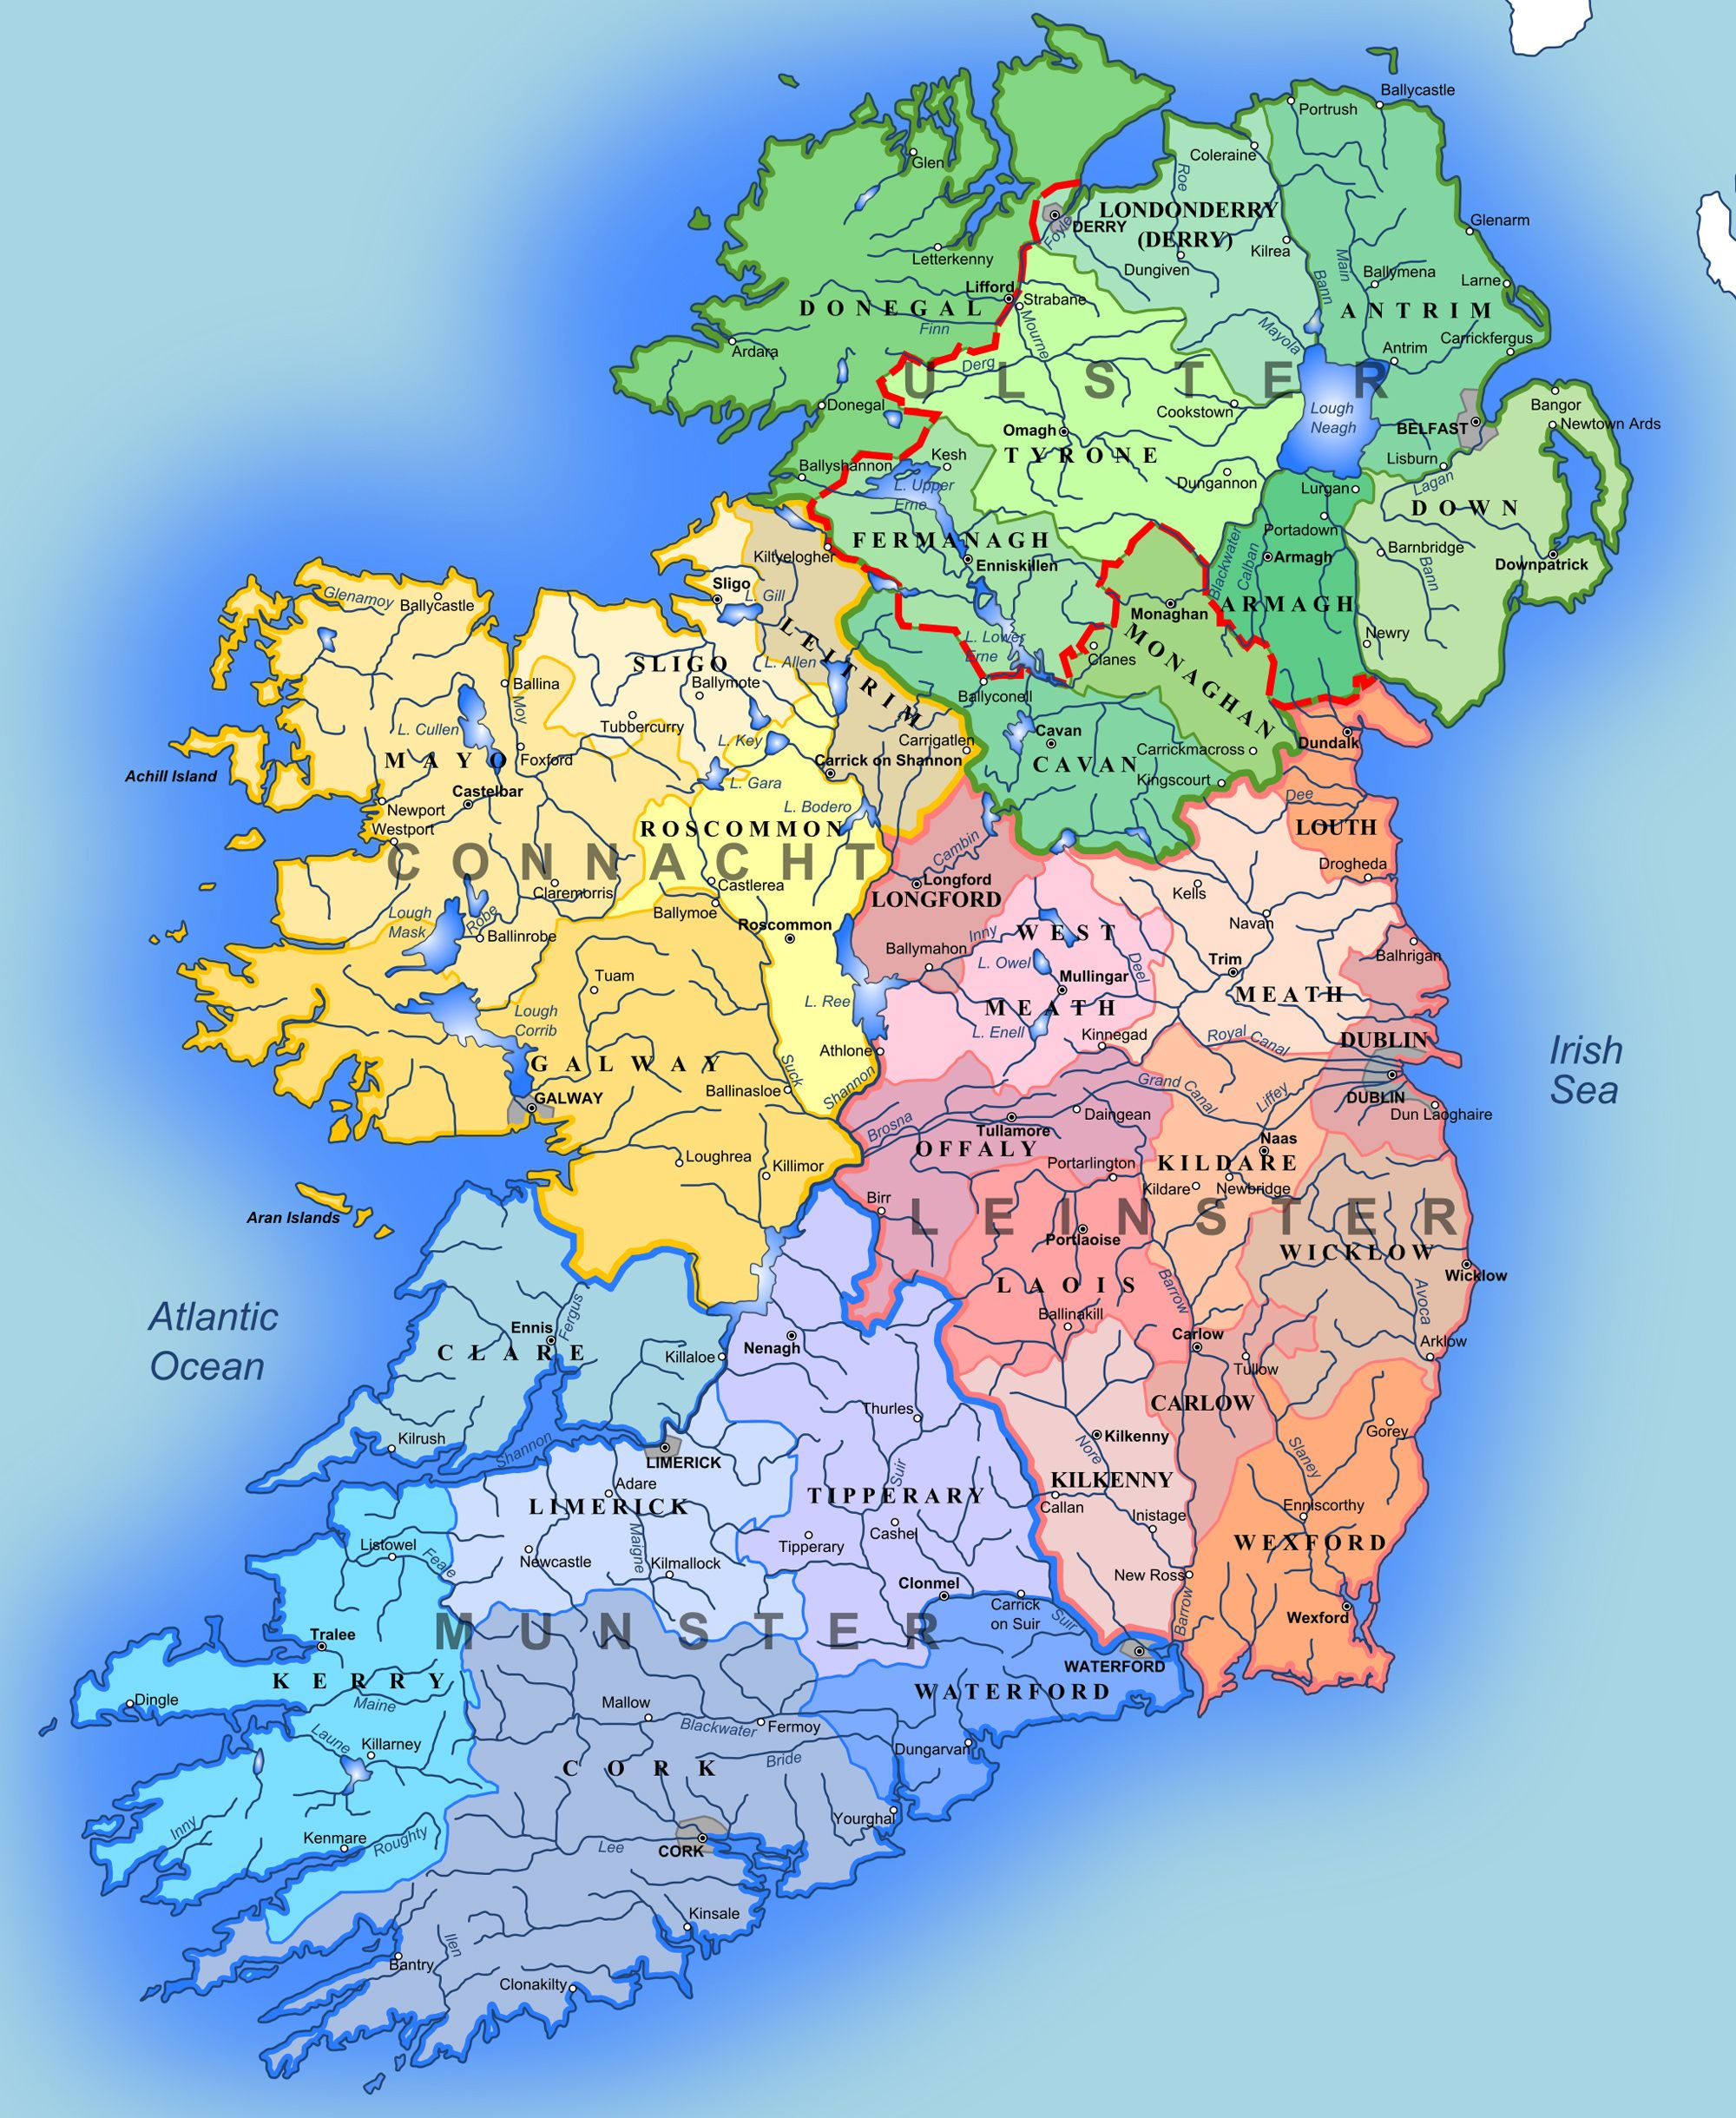 Ireland And Northern Ireland Map.Administrative Map Of Ireland Cartography Pinterest Ireland